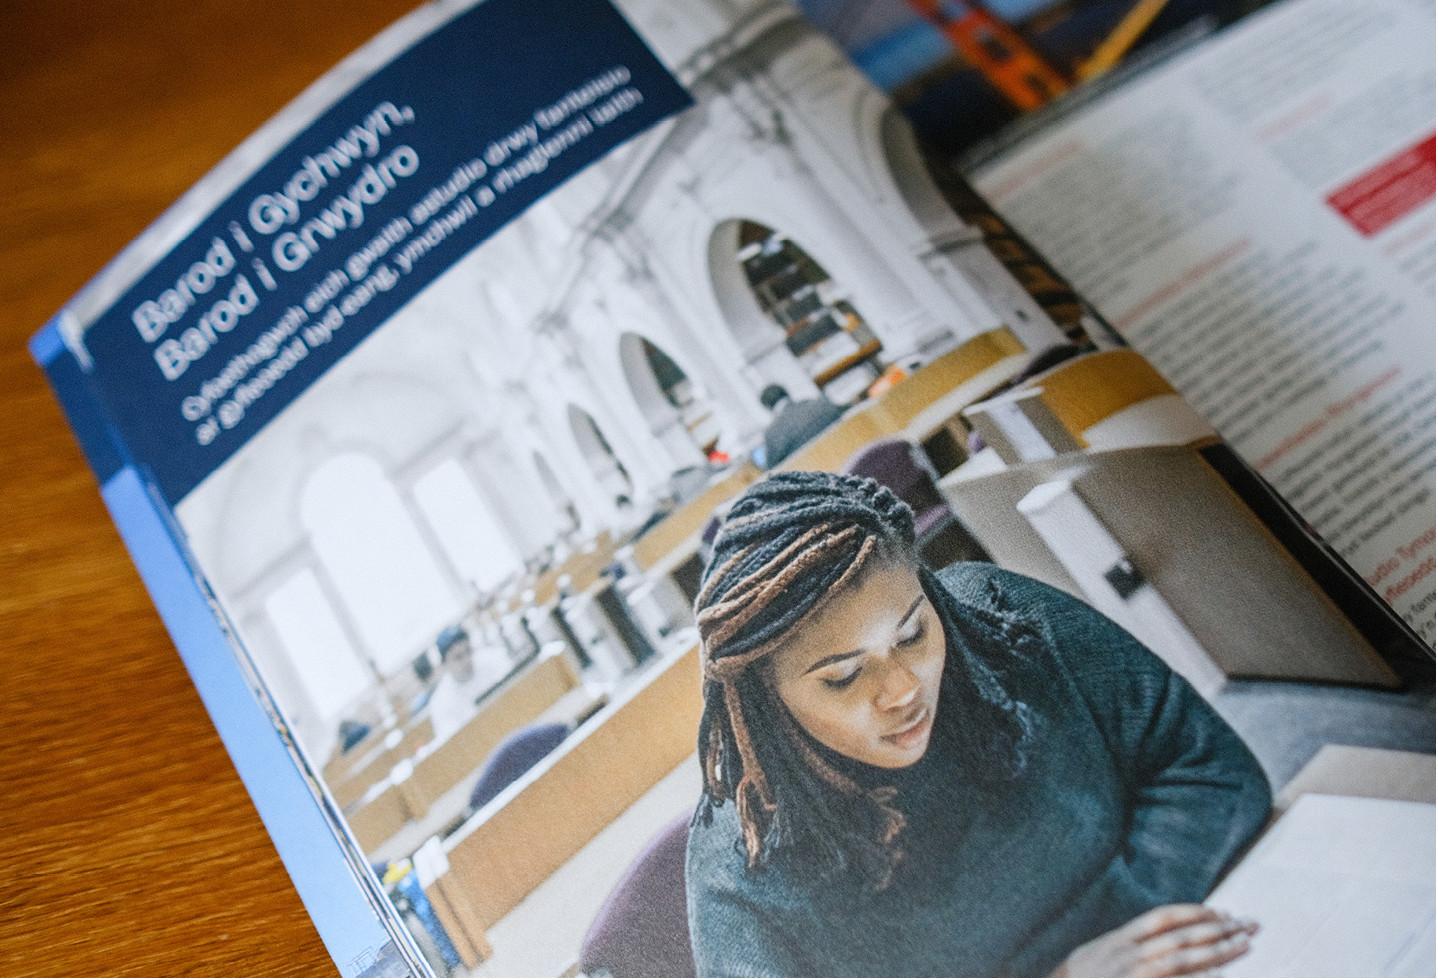 Cardiff University prospectus